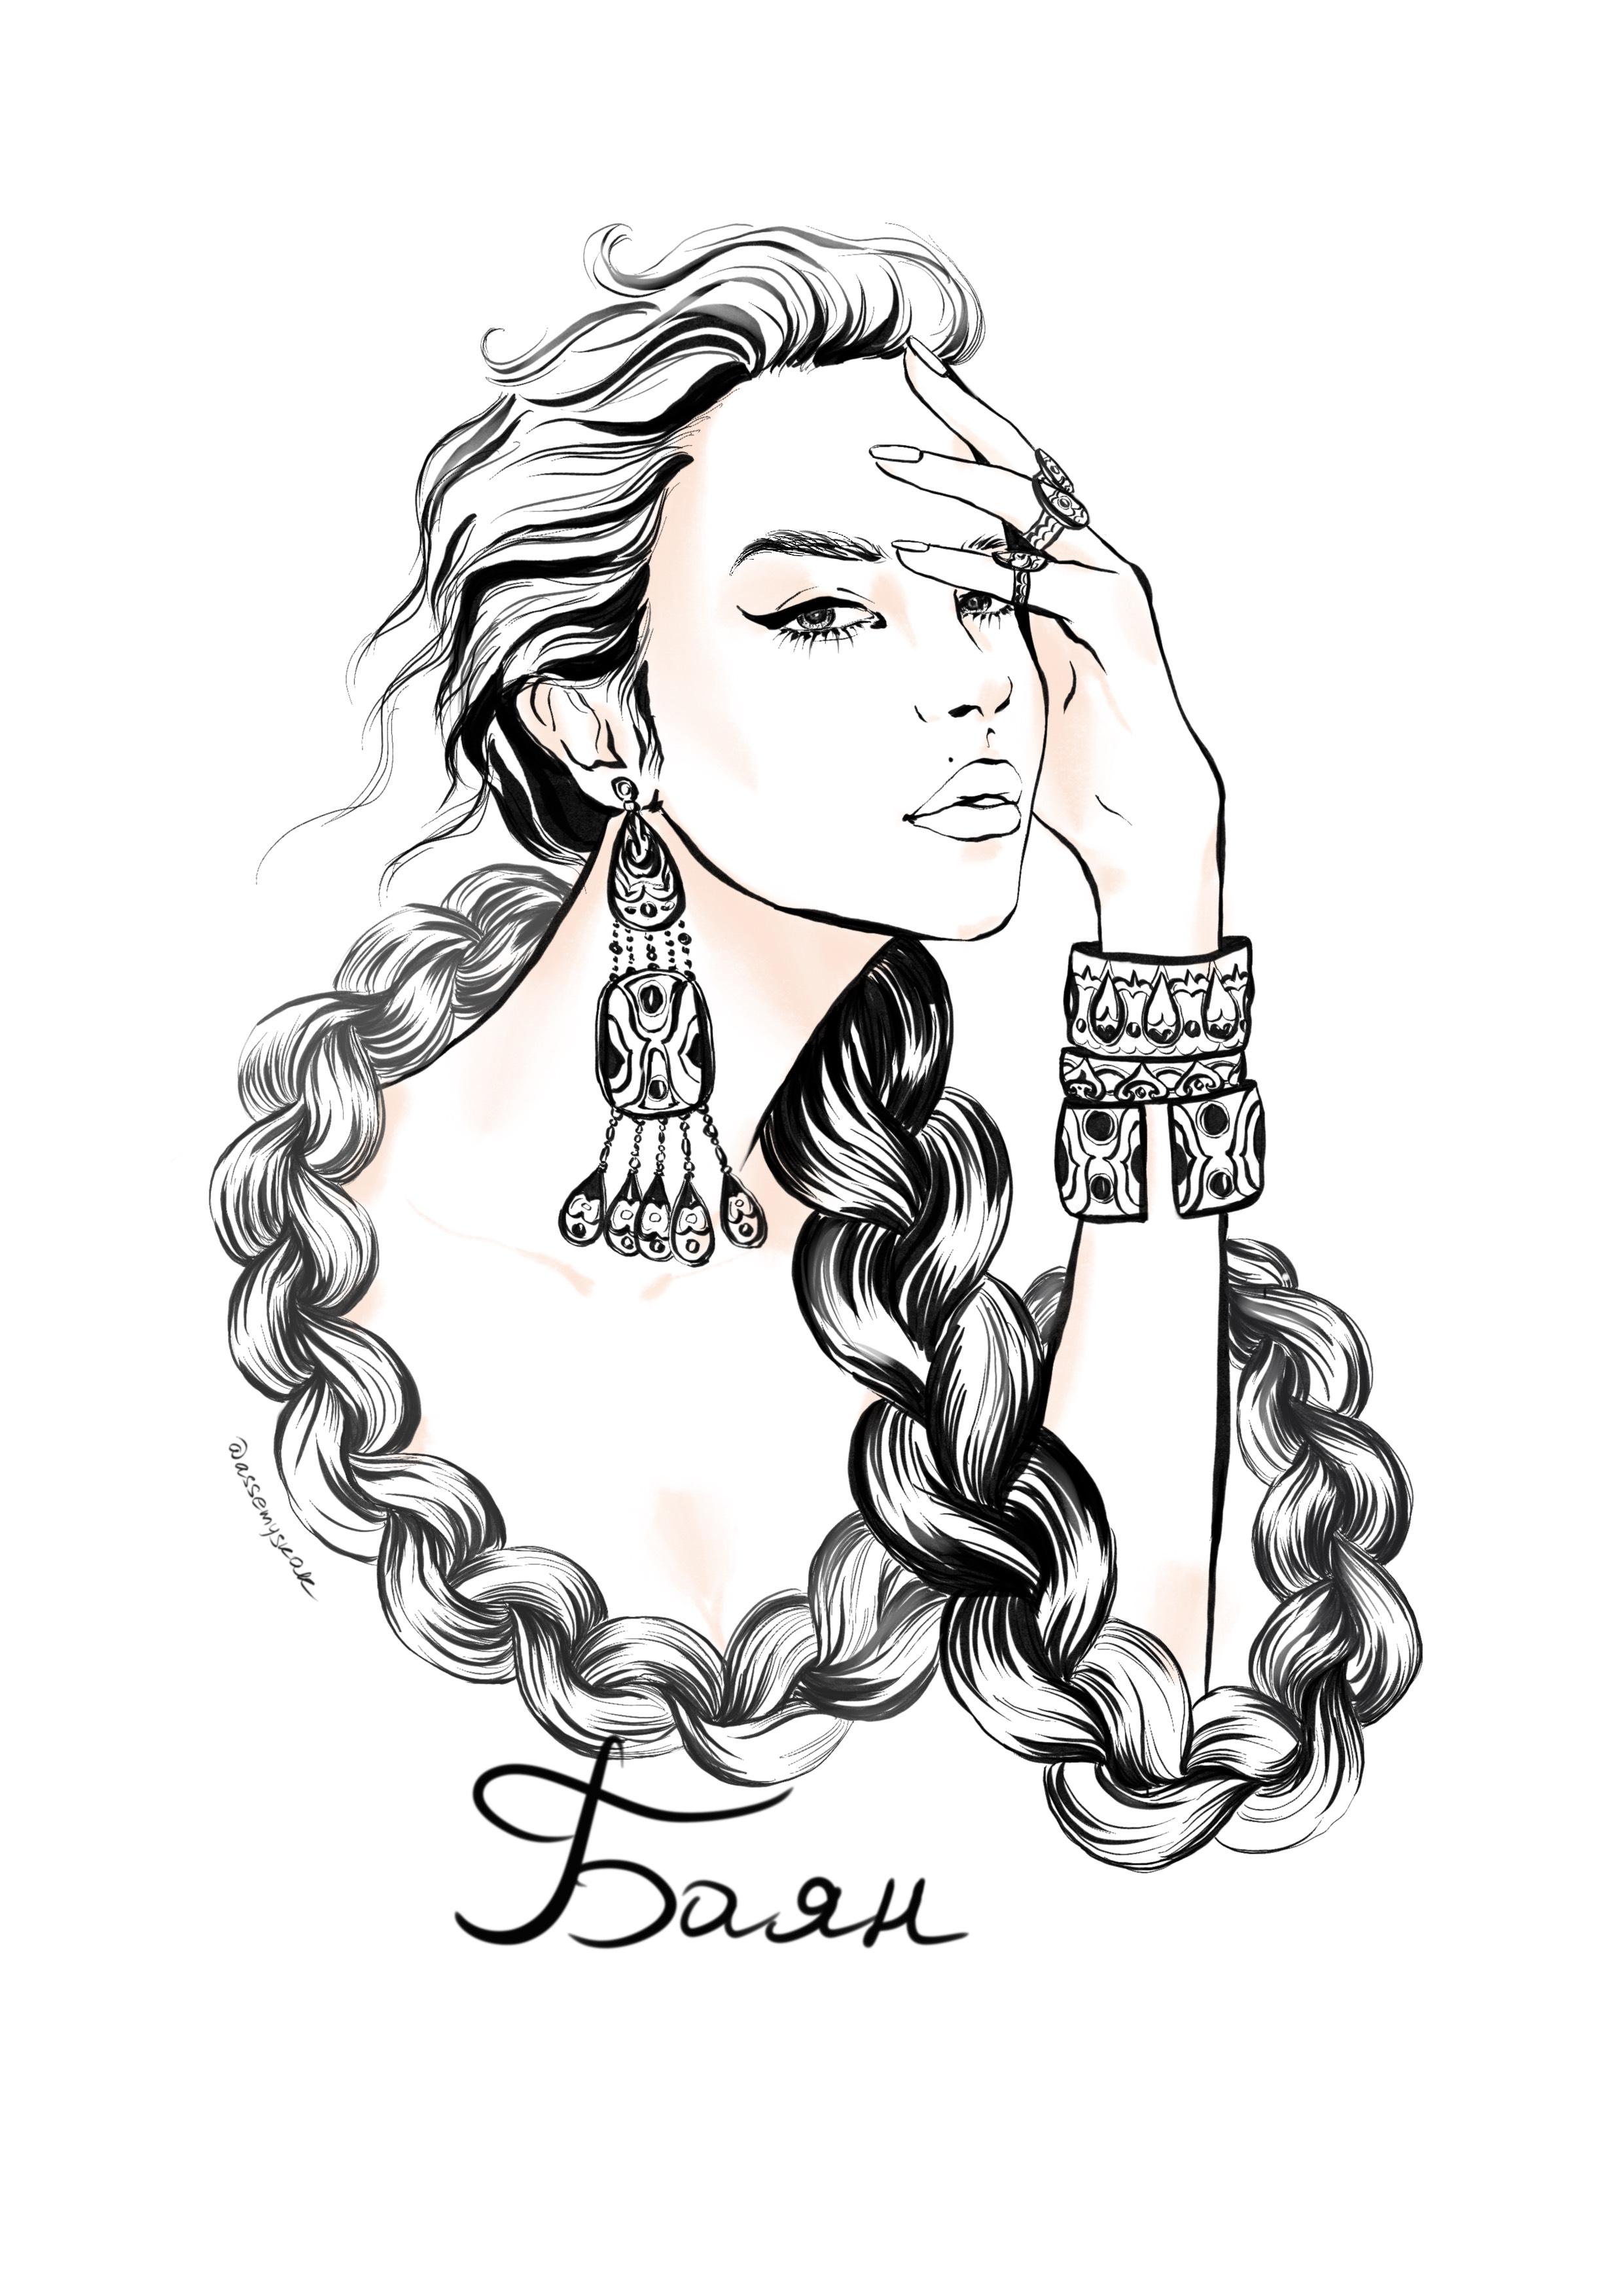 Казахская fashion-иллюстрация от Асем Ыскак